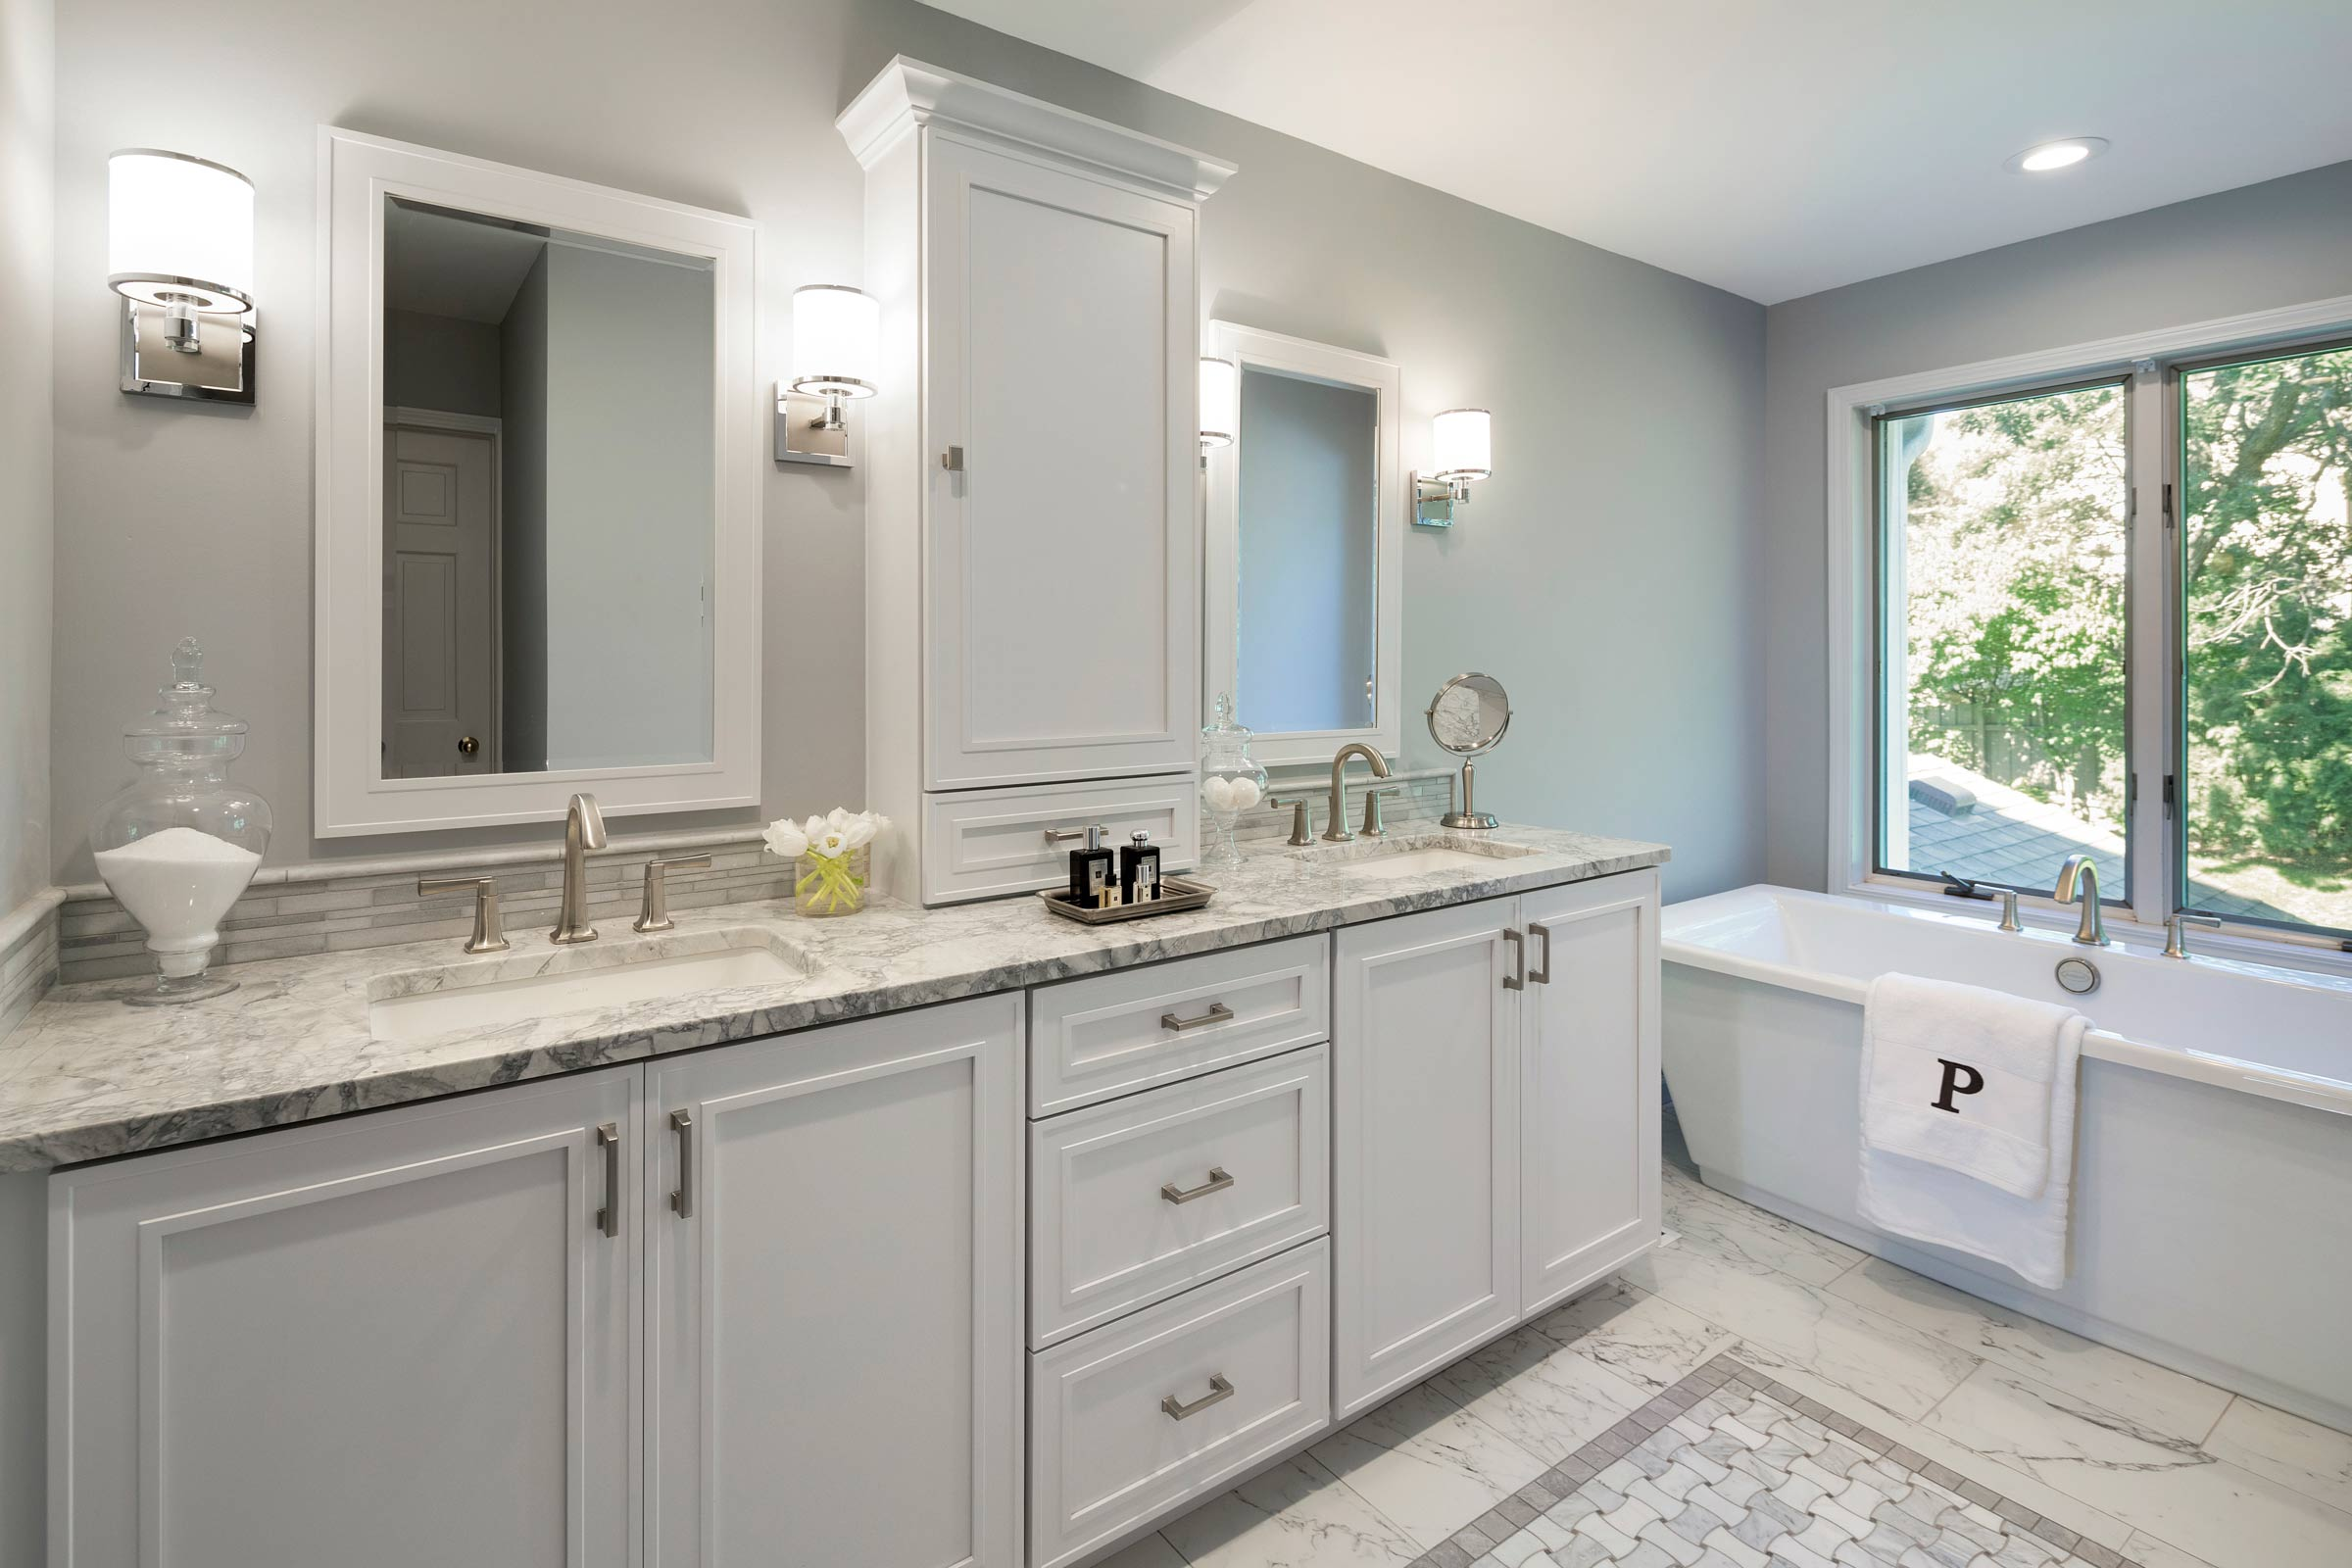 Maven Design Studio Portfolio - Bathroom design with double vanity, marble countertops, white cabinets